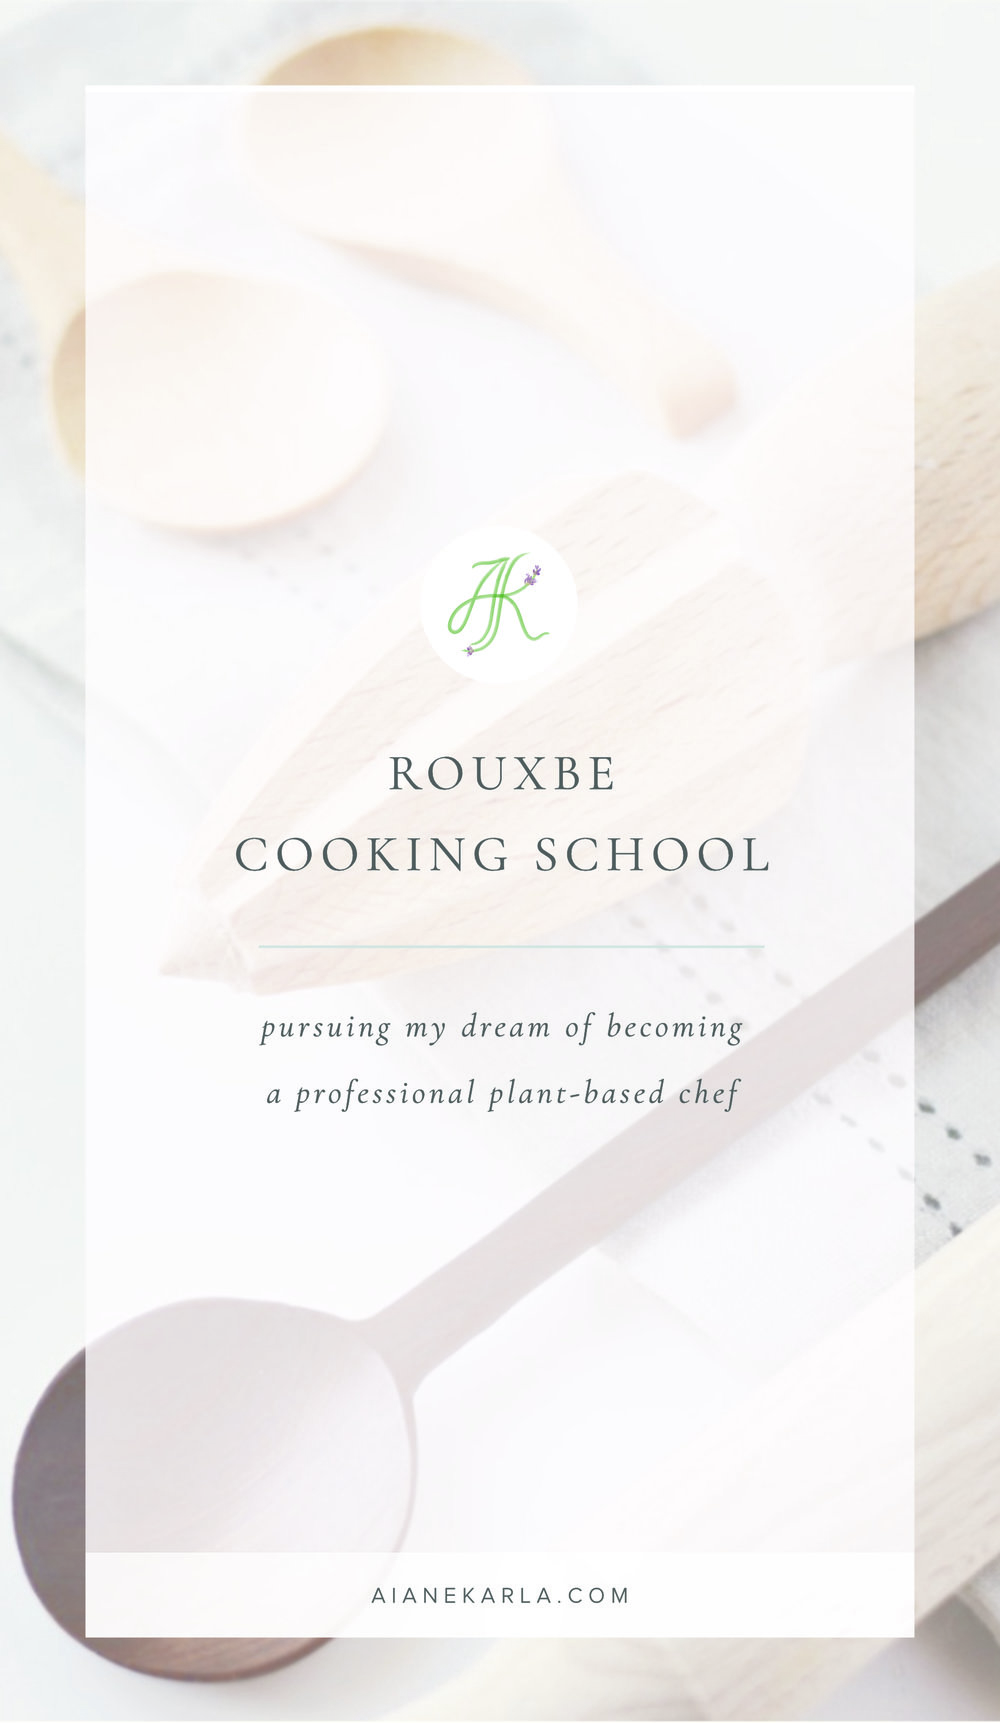 Rouxbe Cooking School | Aiane Karla | www.aianekarla.com